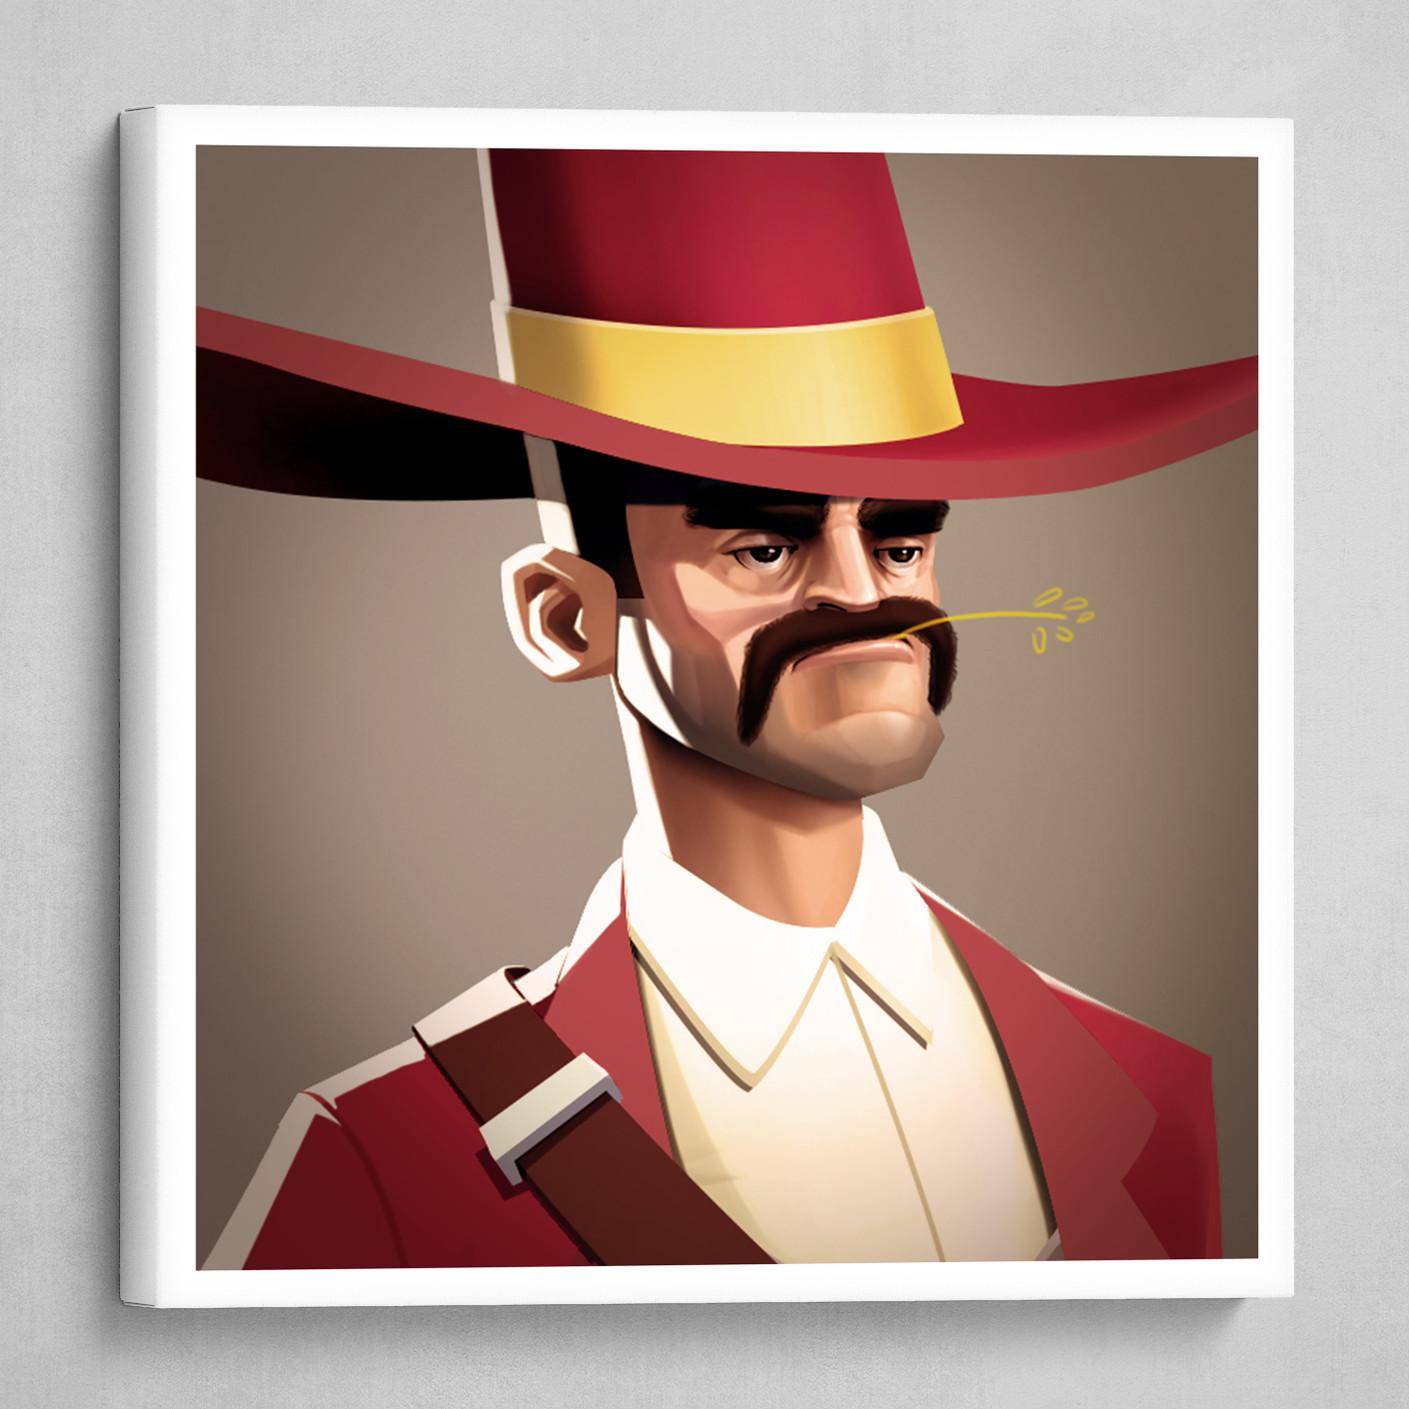 Cowboy - Man